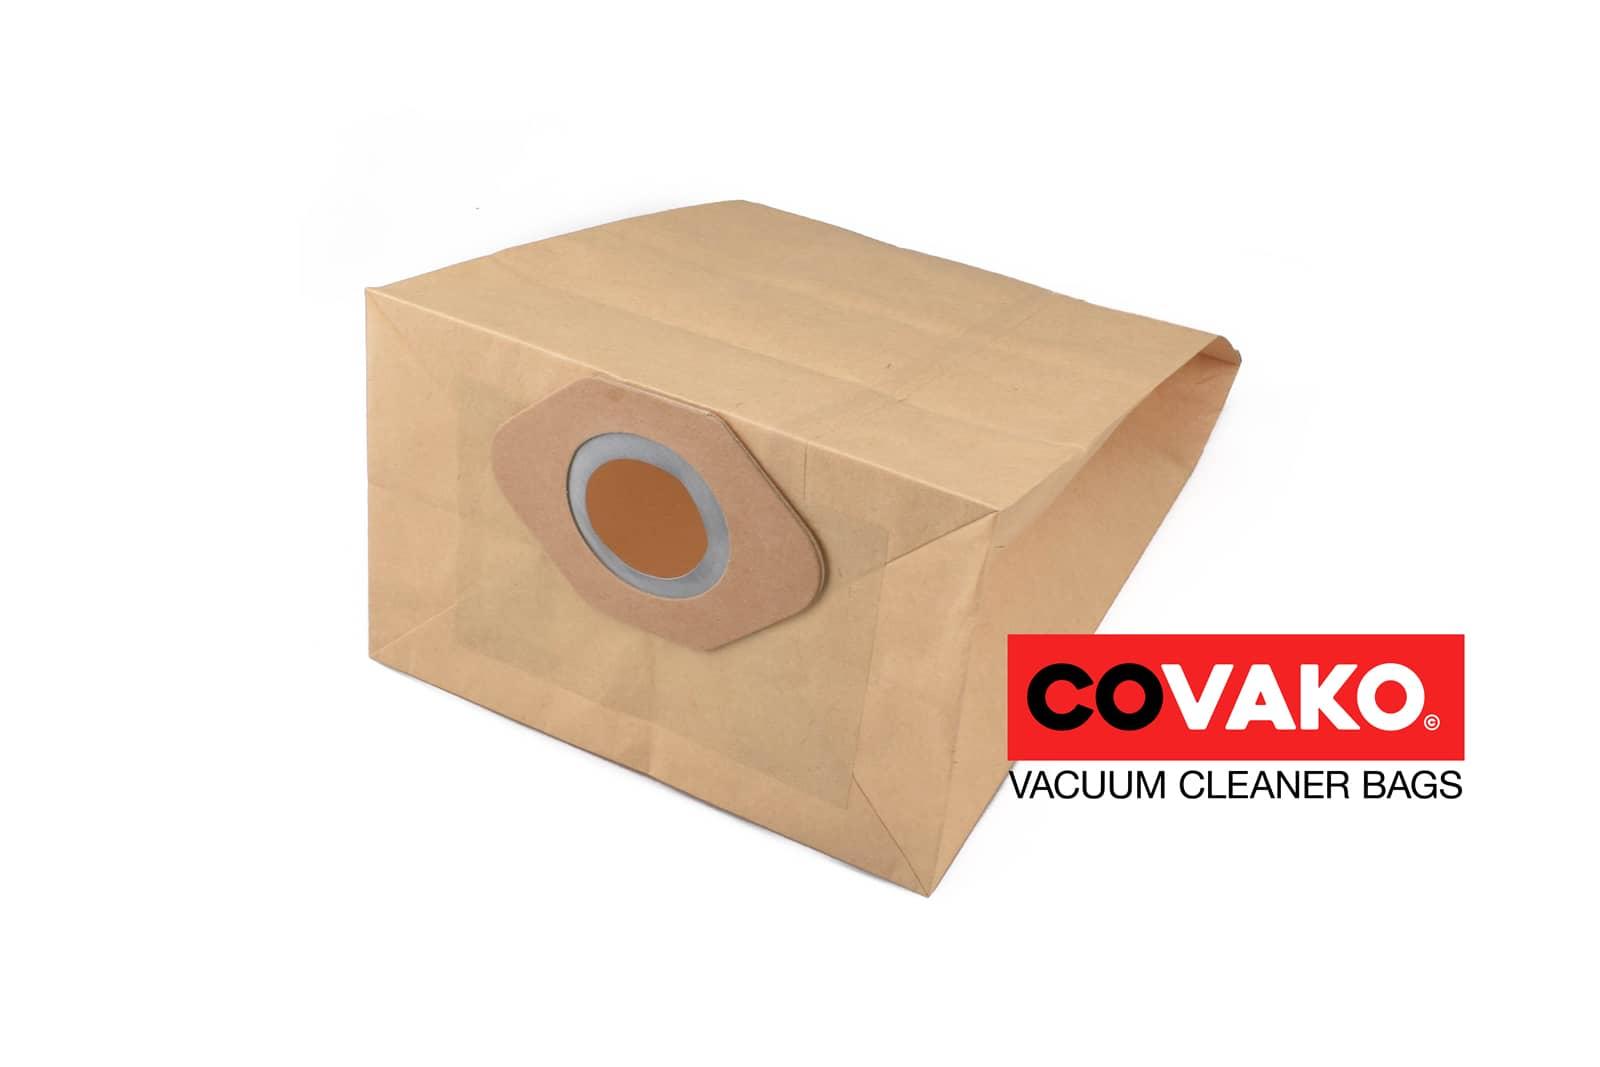 Wap GA 70 / Papier - Wap sacs d'aspirateur